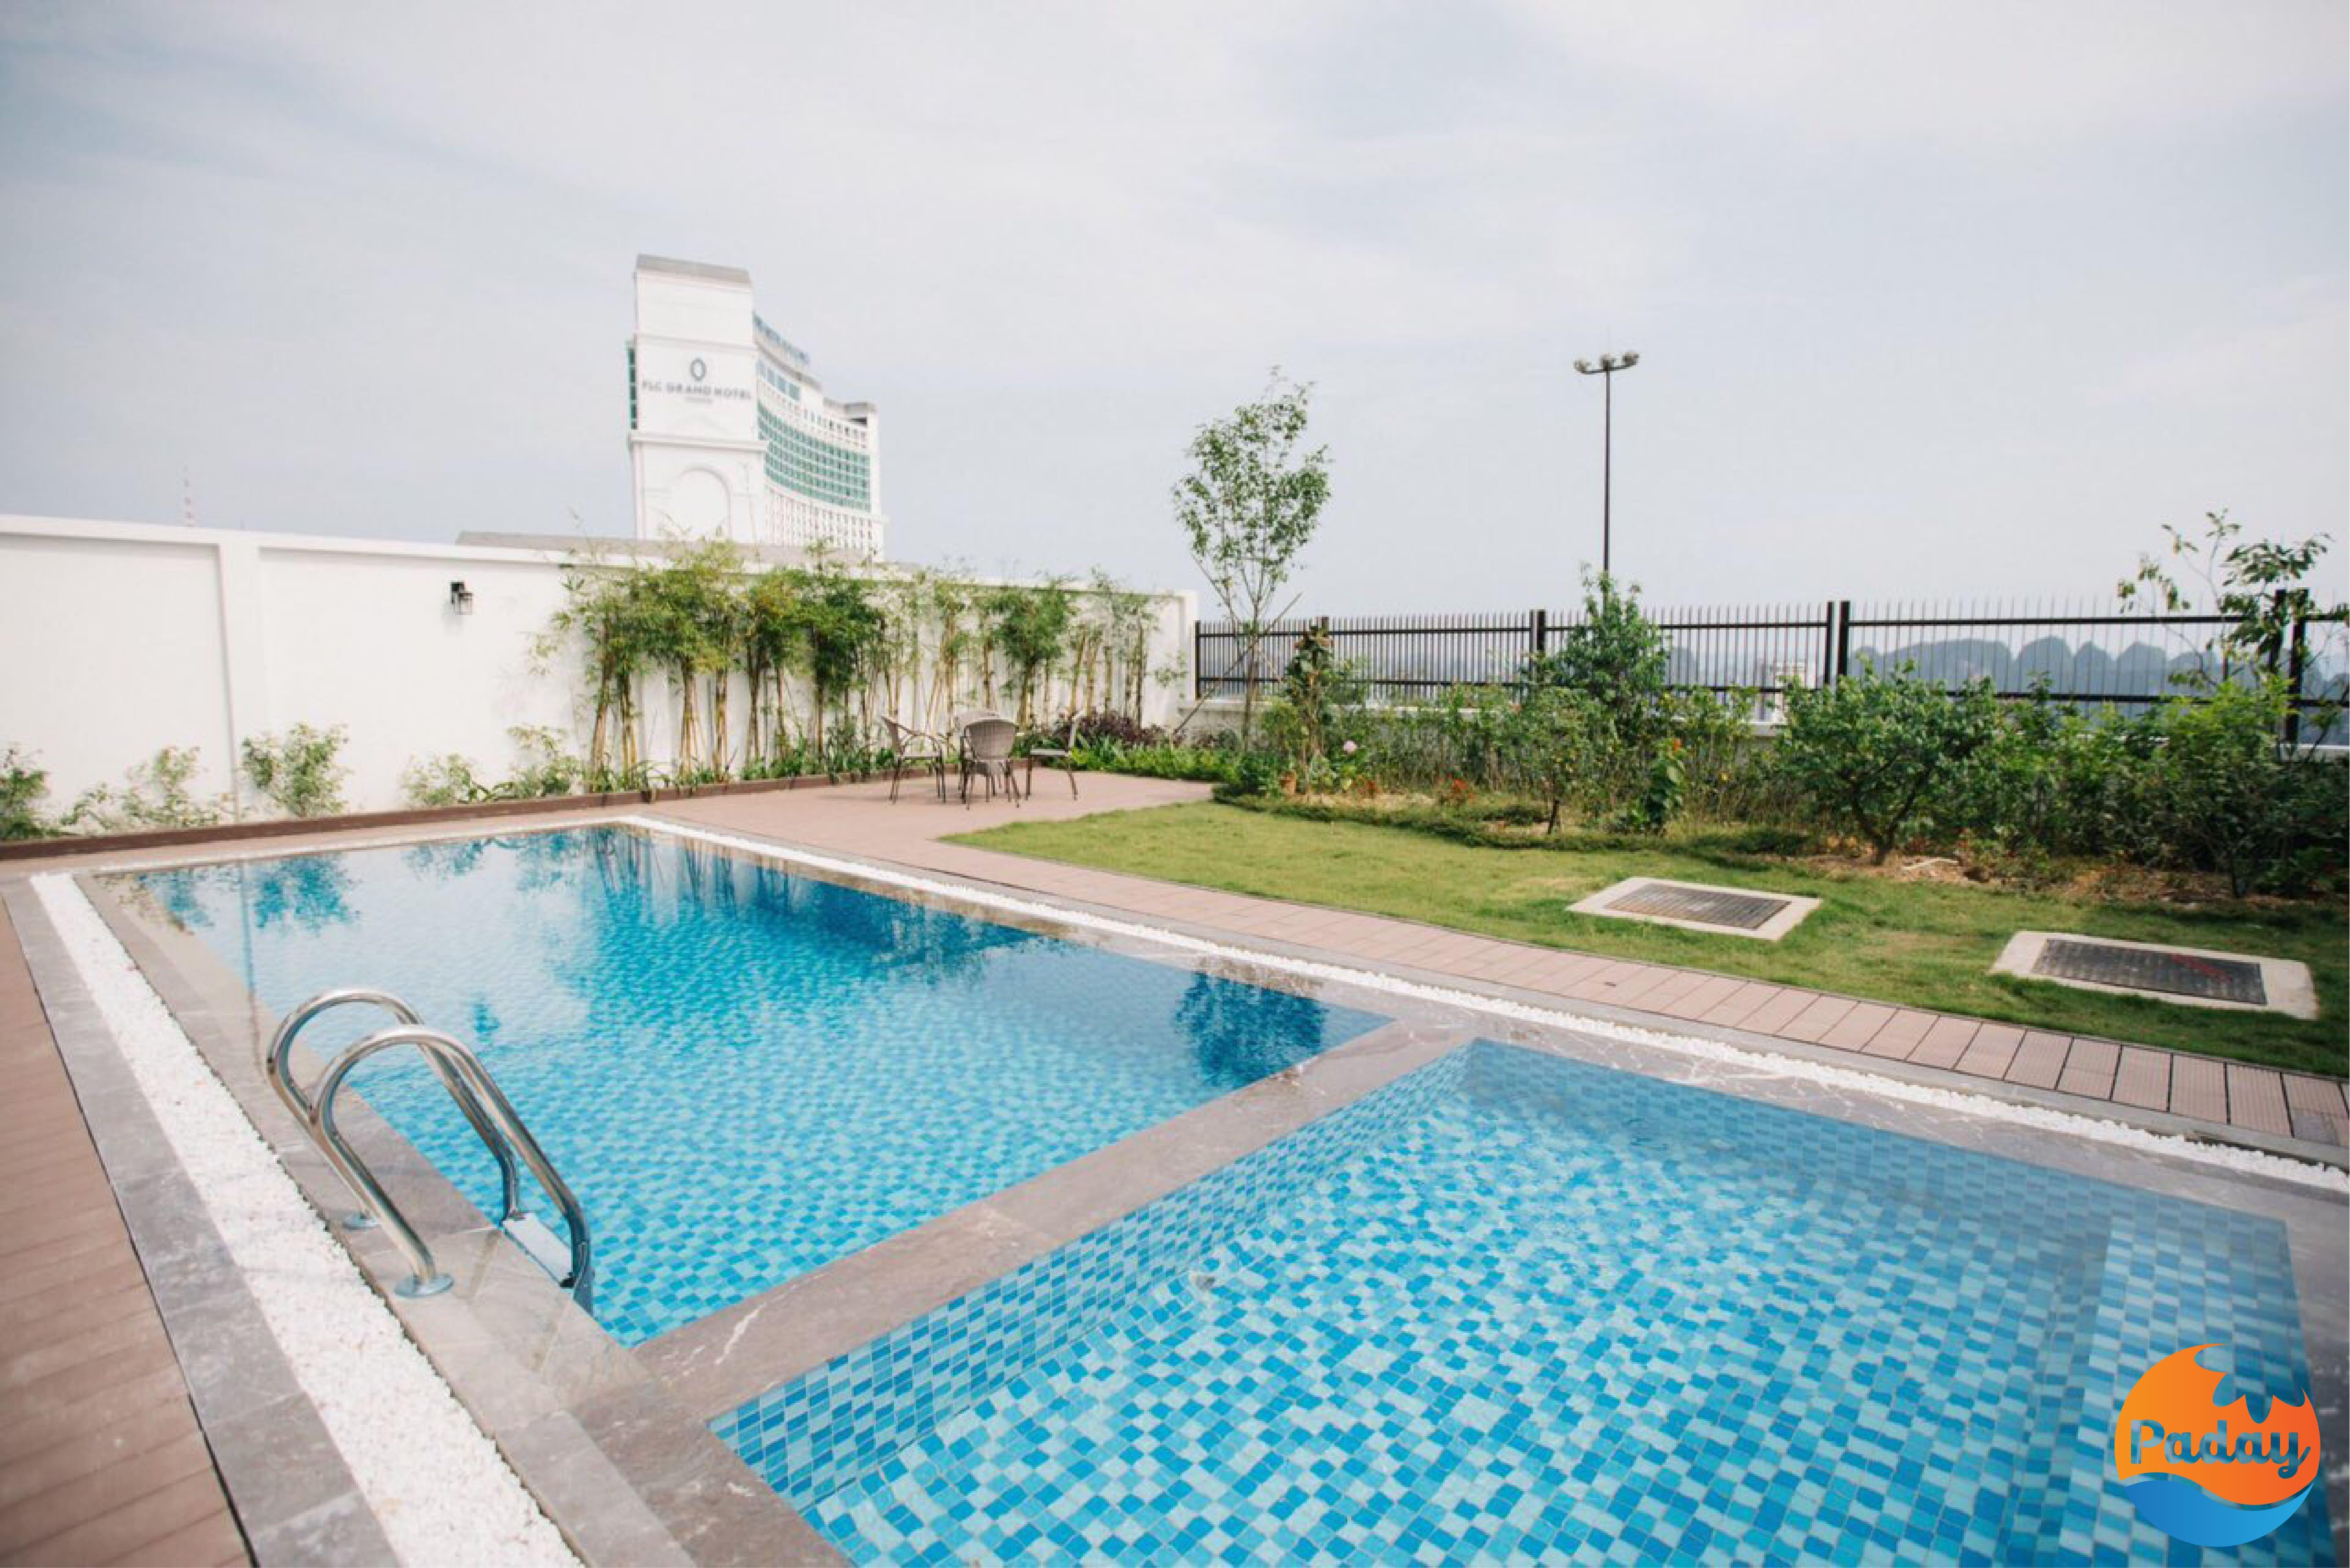 bể bơi resort hạ long bay